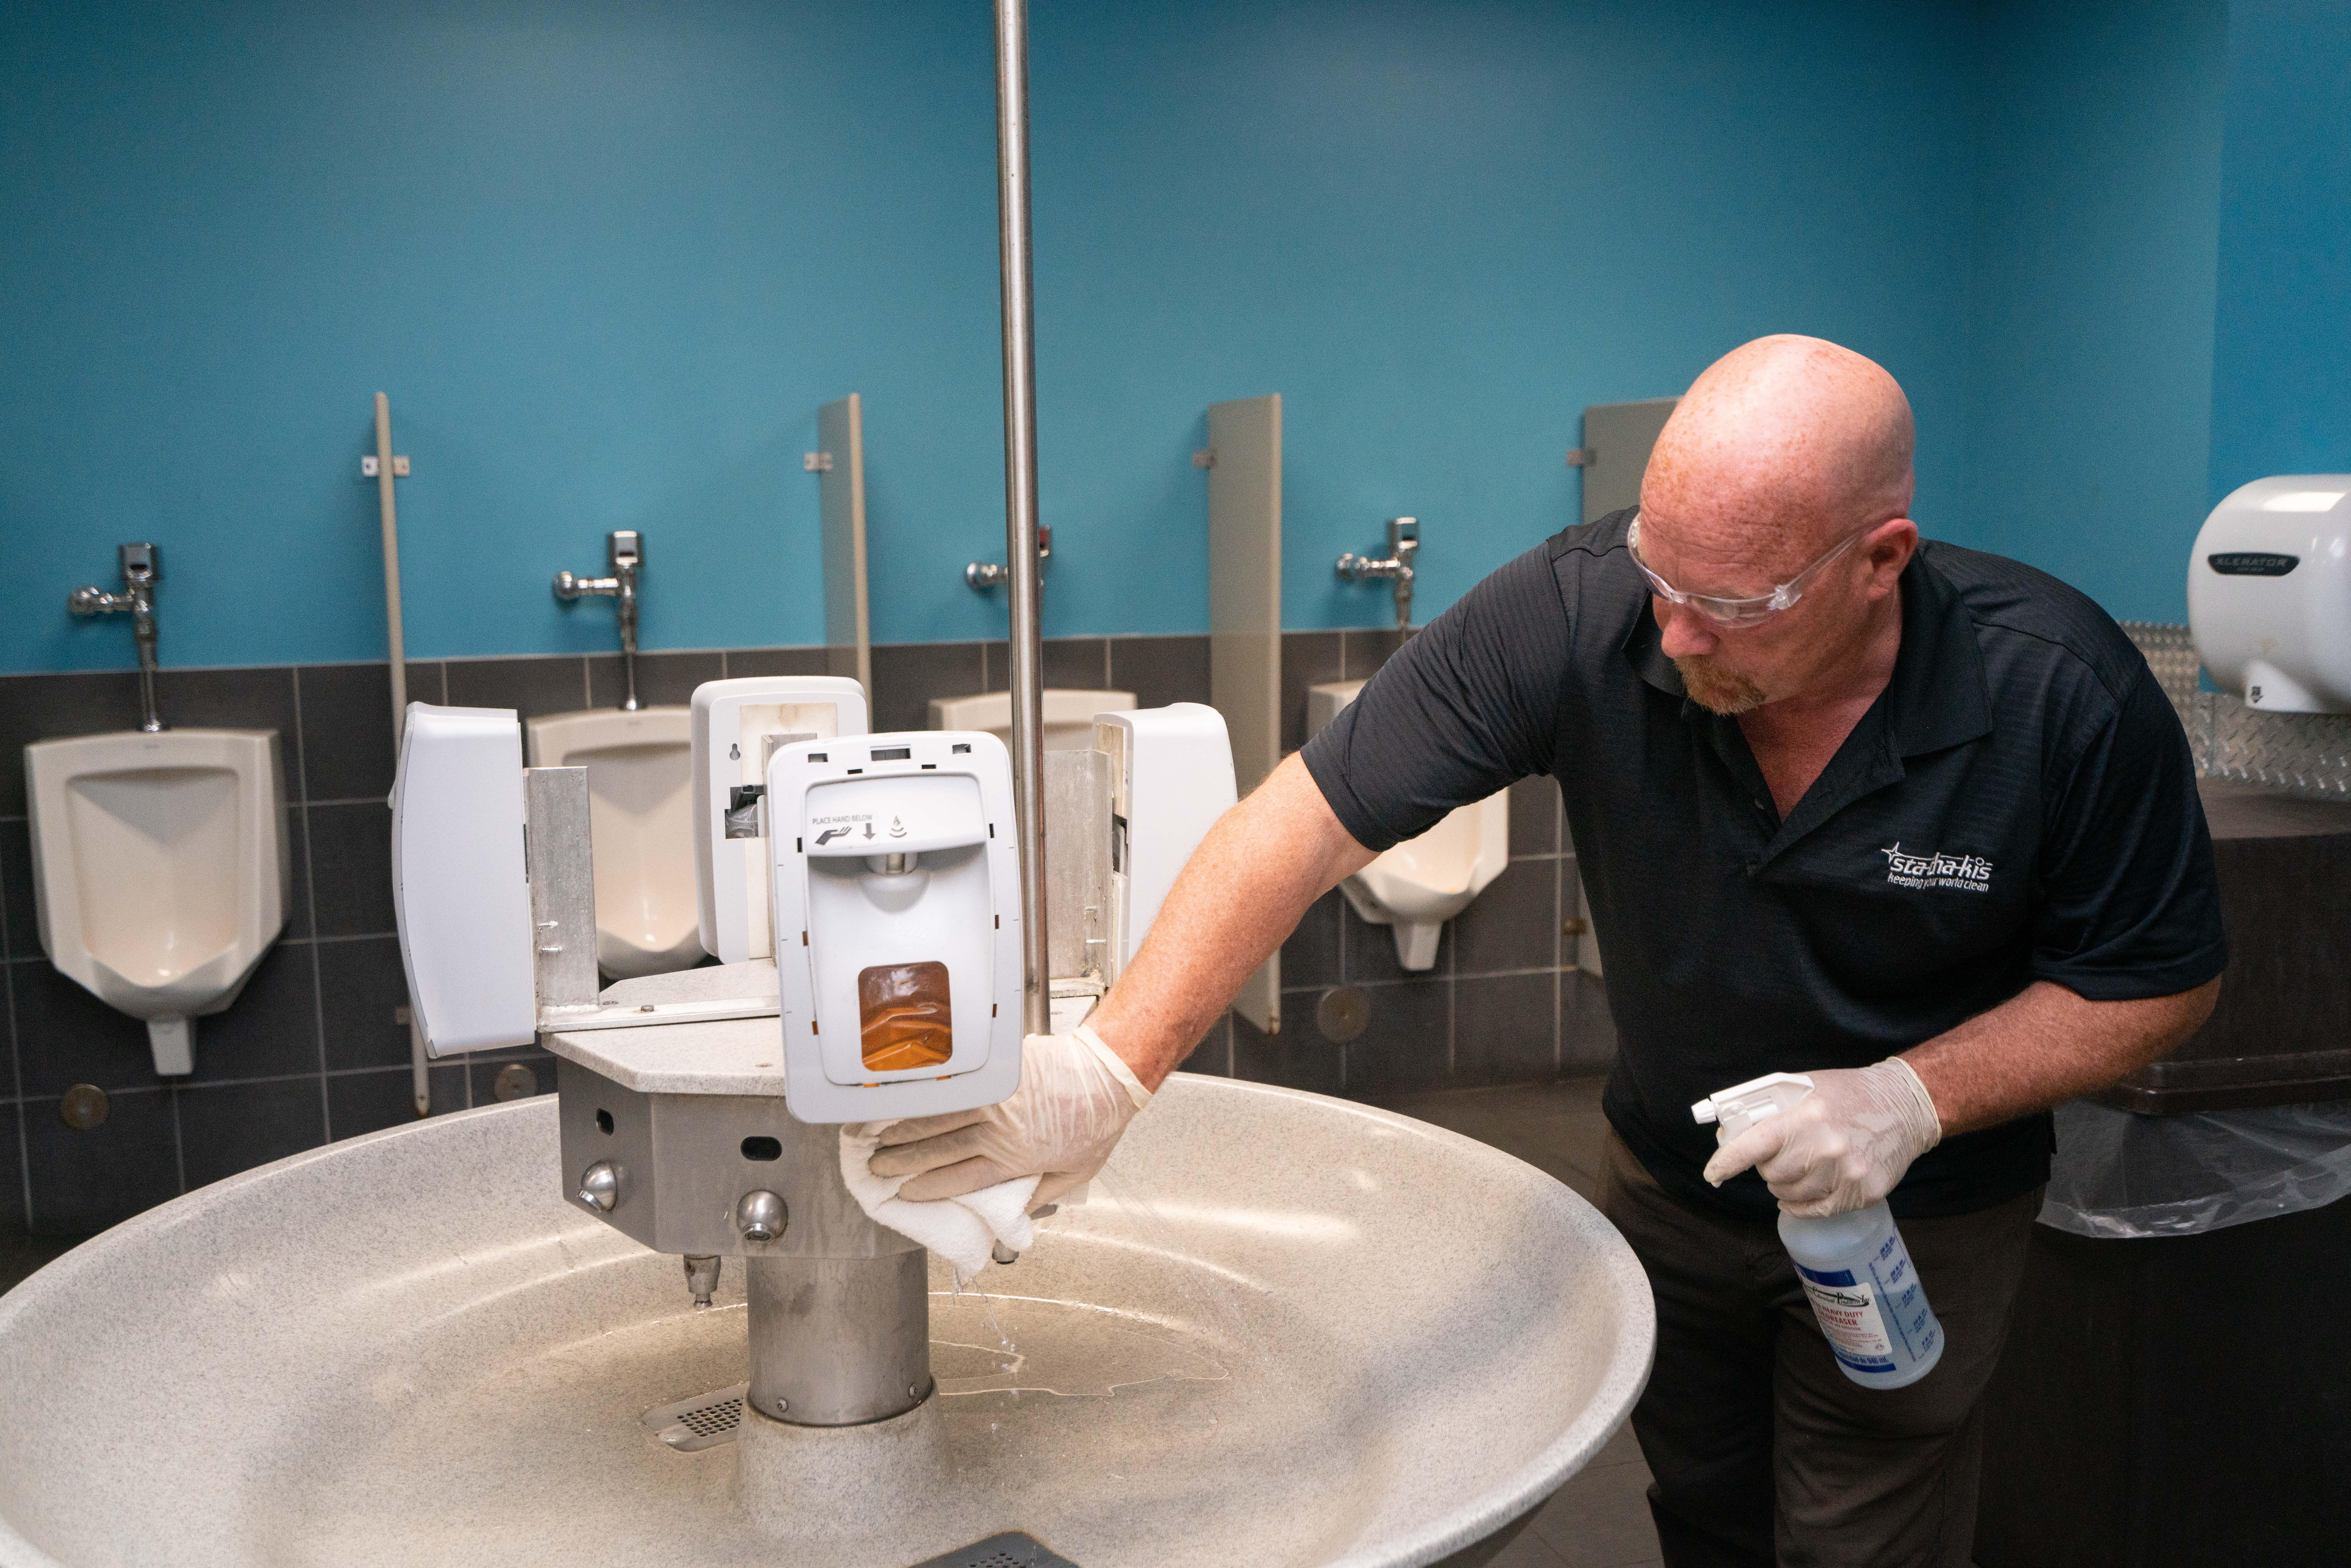 Restroom Disinfecting